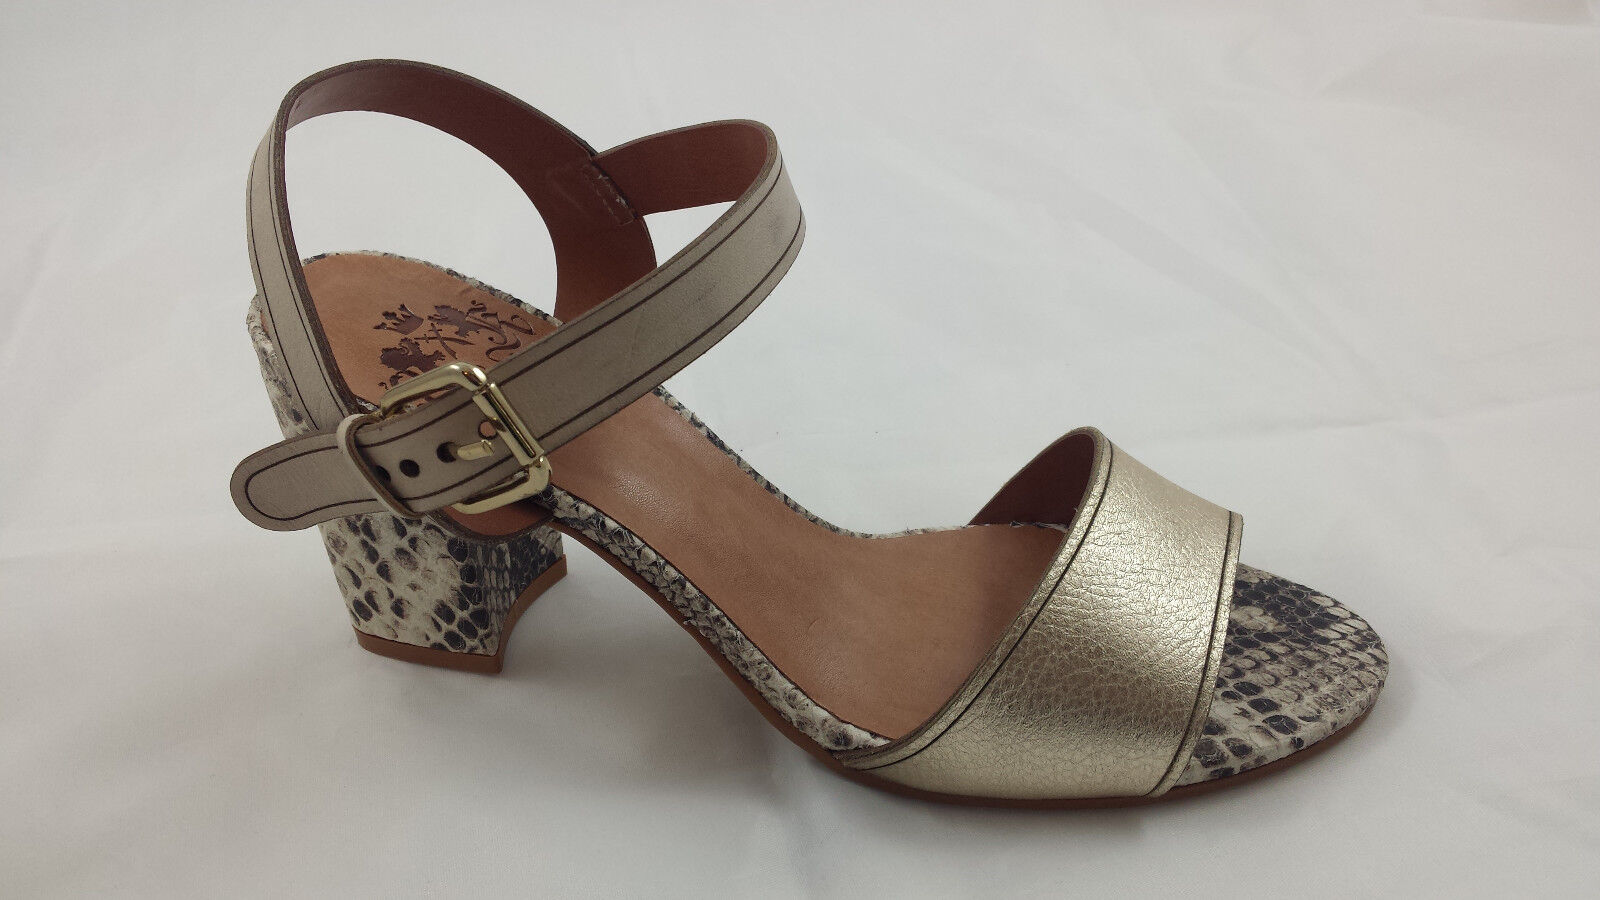 OTTO KERN 70430 Sandale SANDALETTE Platin Natur GOLD Gr Gr Gr 42 NEU 21ce29